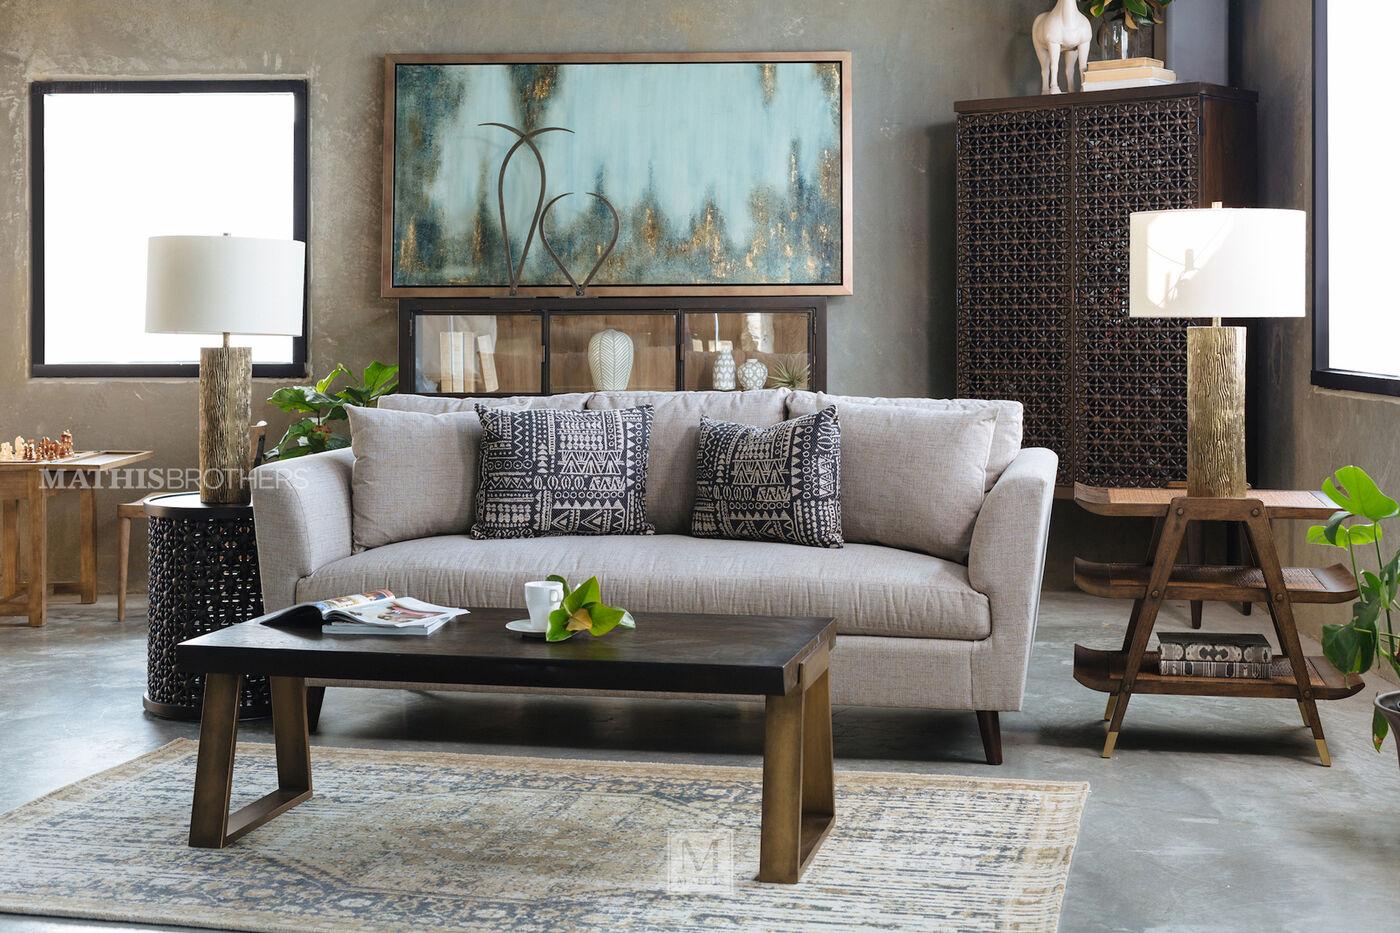 Thomasville Living Room Furniture Thomasville Ellen Degeneres Holmby Sofa Mathis Brothers Furniture